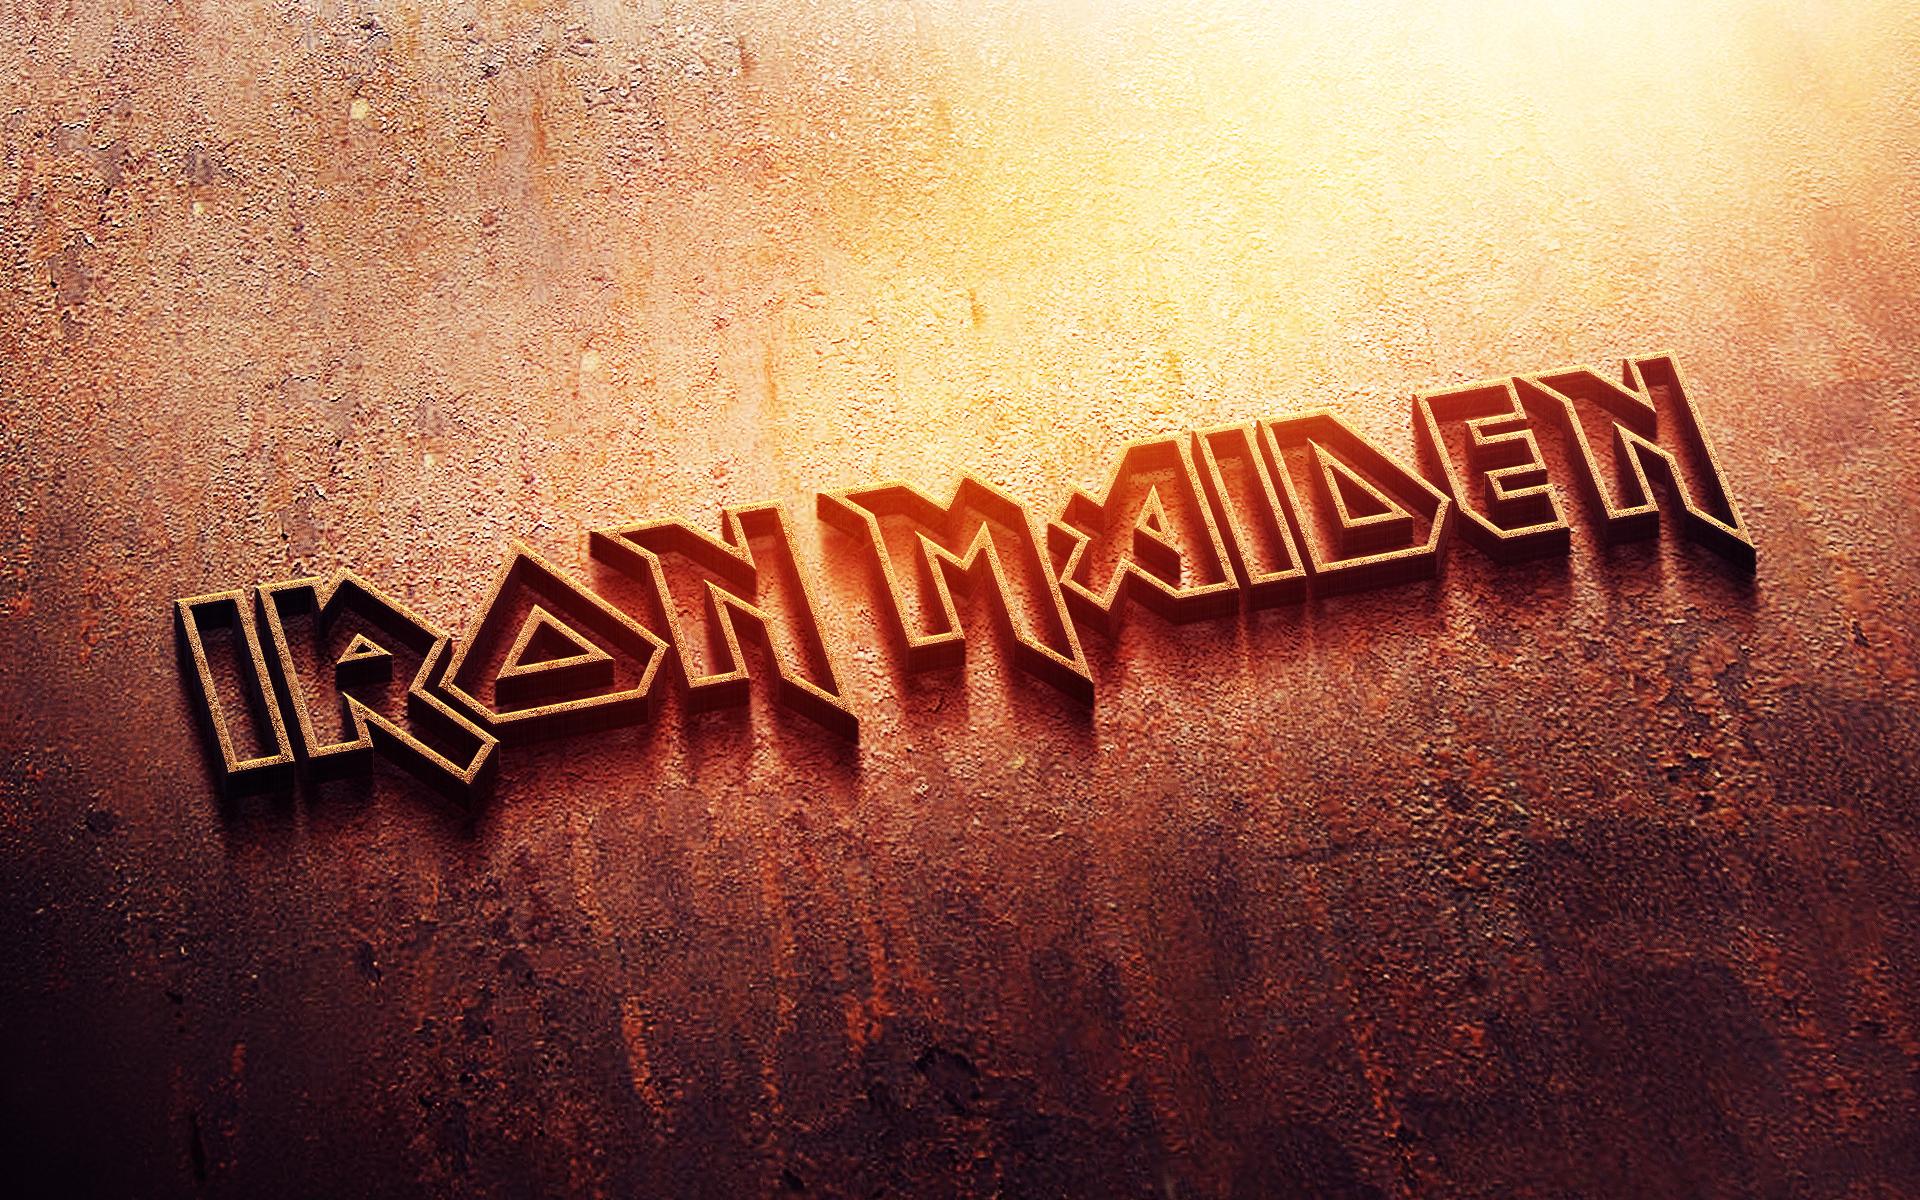 Iron Maiden Wallpaper 929 Cool Wallpapers Hd Iron Maiden Iron Maiden Posters Iron Man Wallpaper